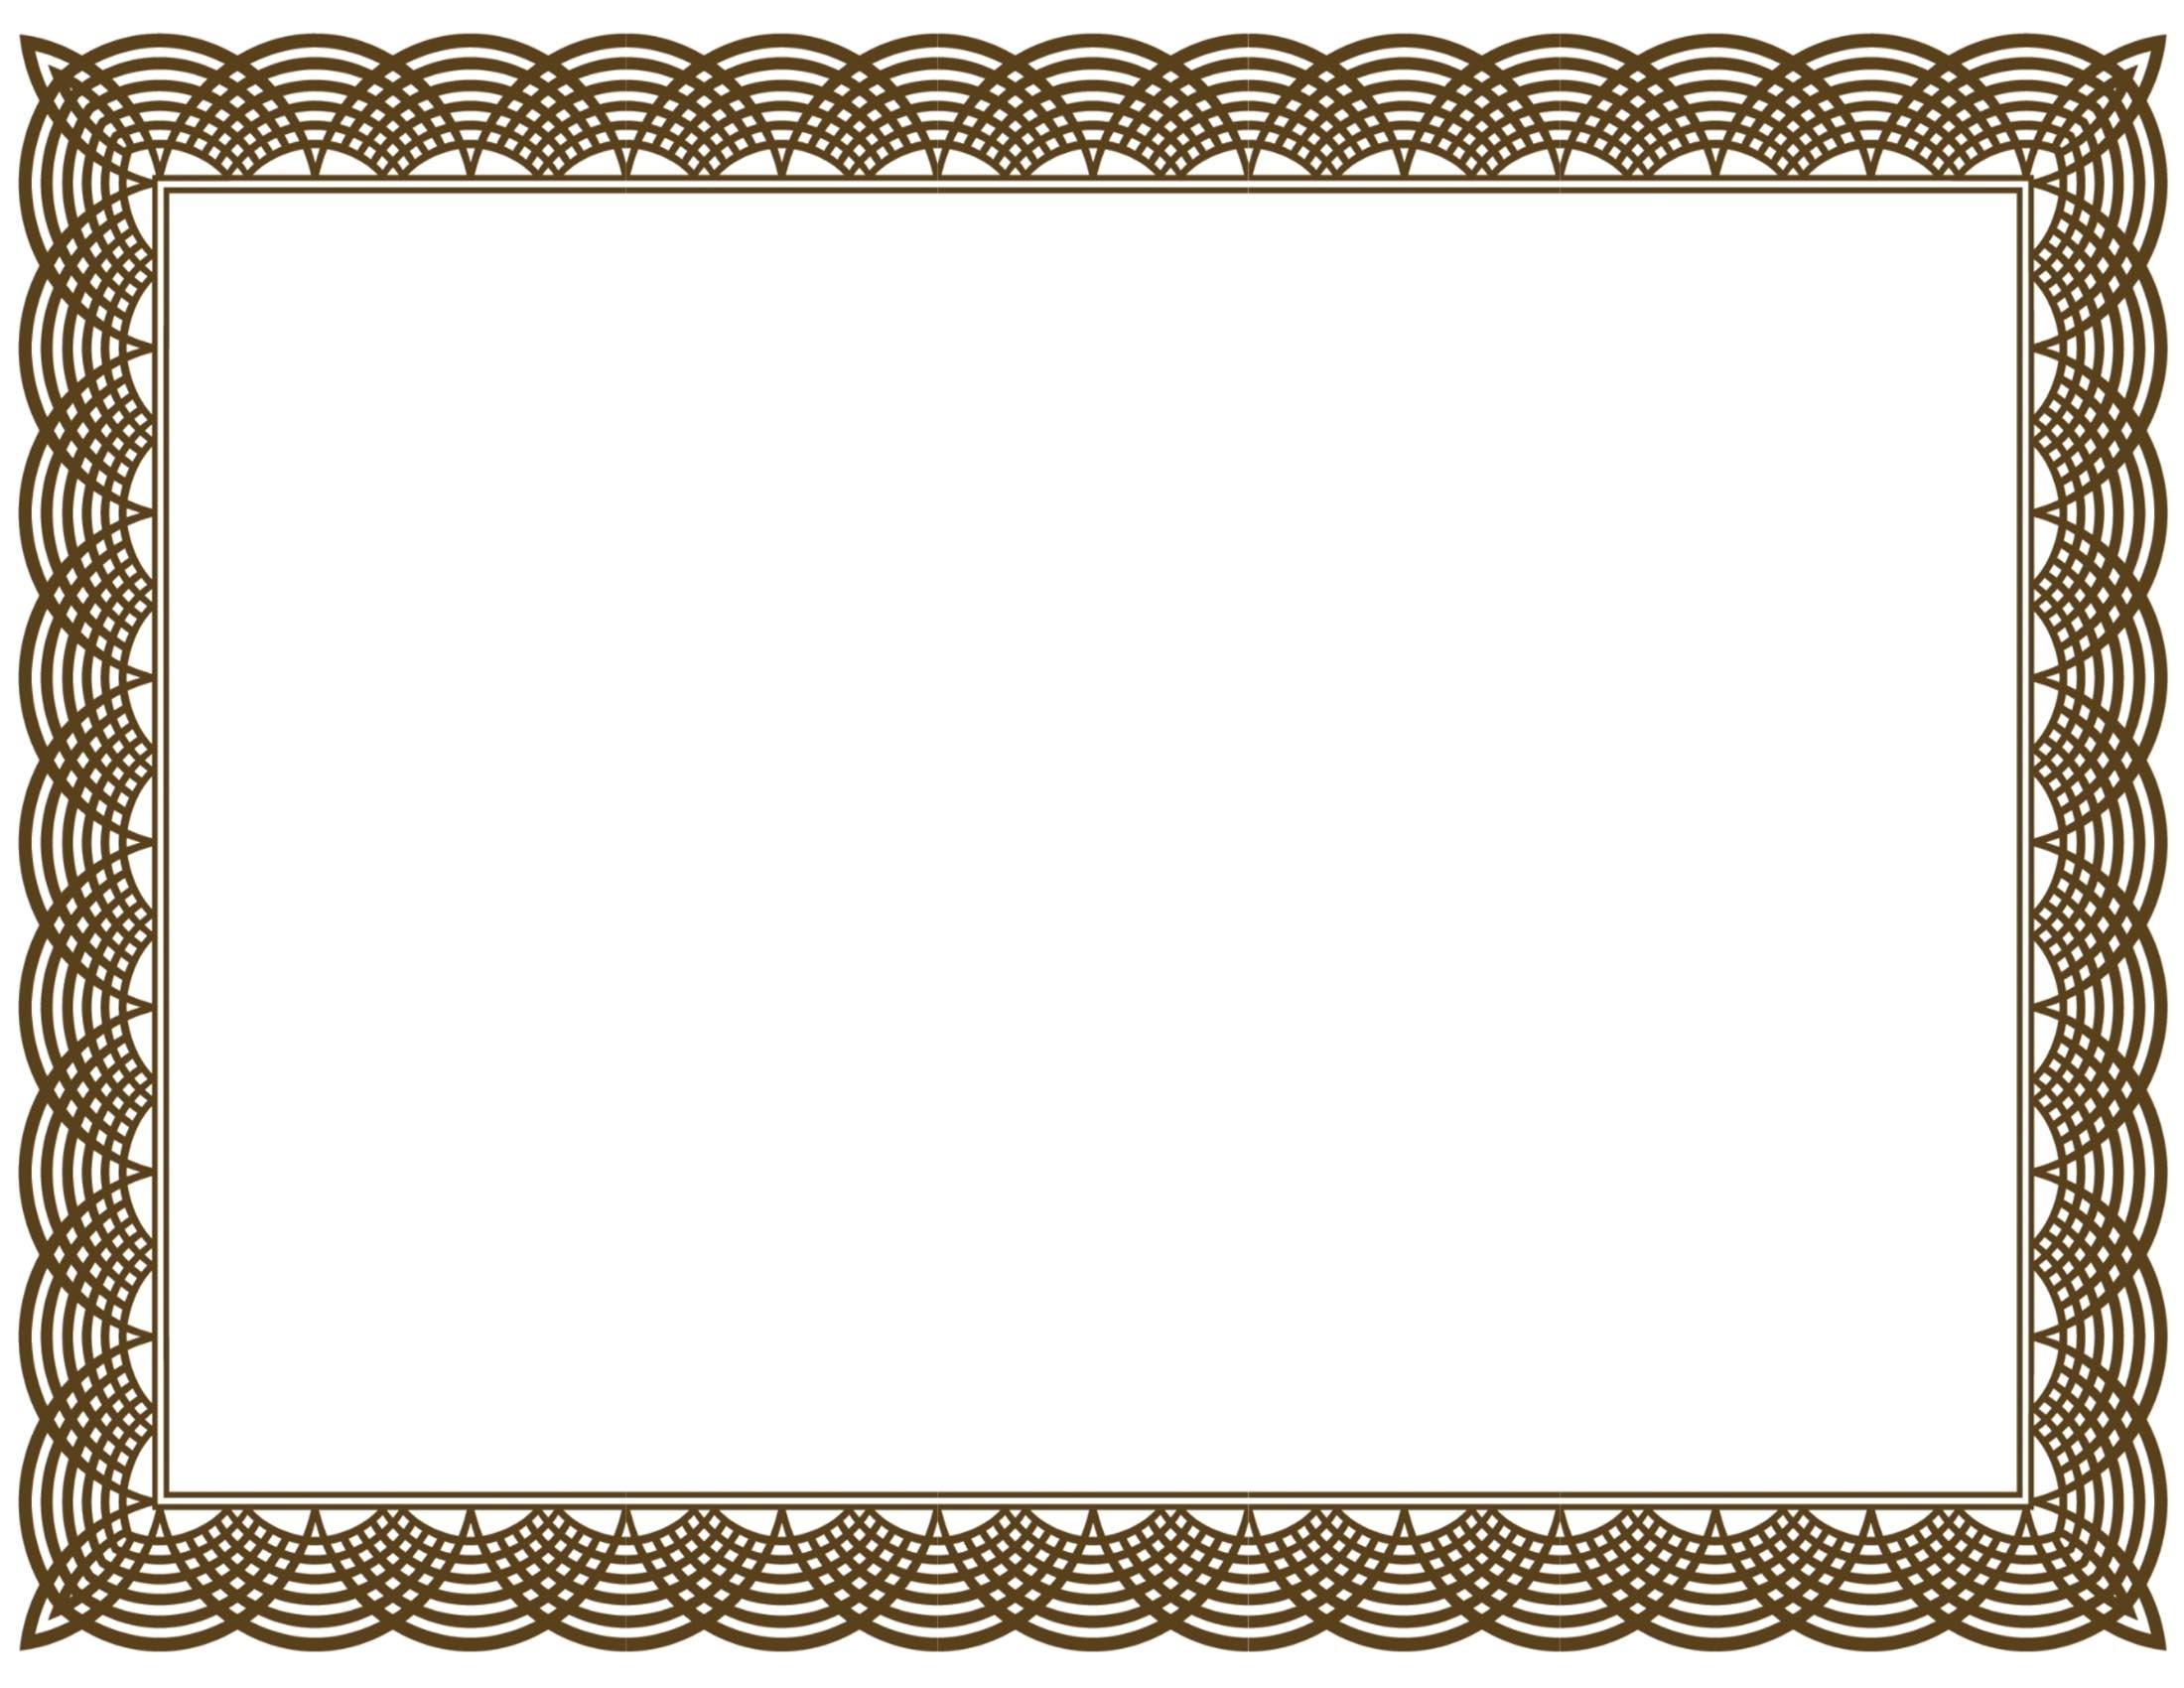 Free border incep imagine. Certificate clipart borders